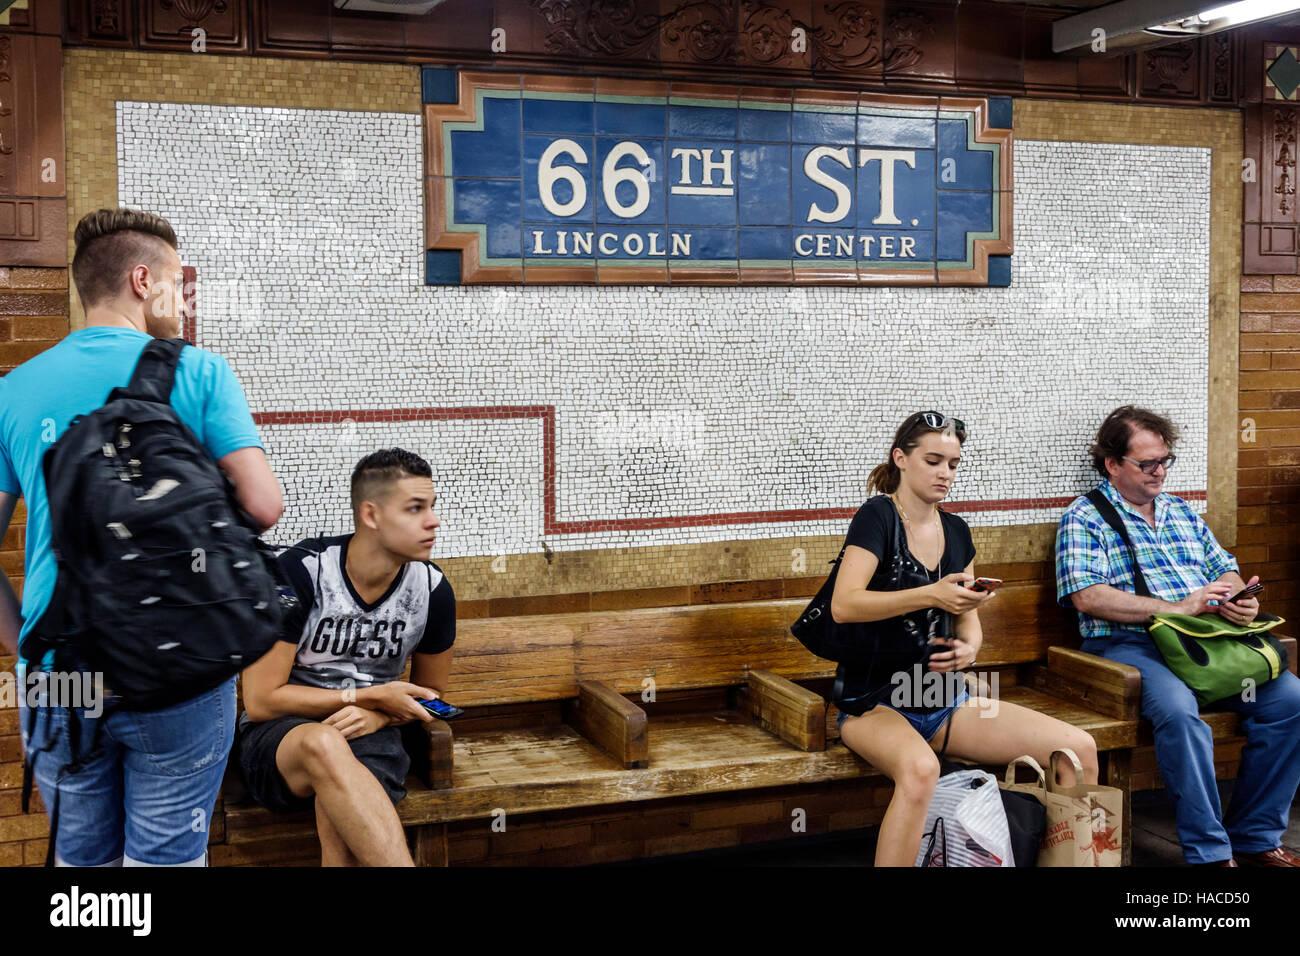 Manhattan New York City NYC NY Upper West Side 66th Street Lincoln Center Station subway platform Hispanic woman - Stock Image